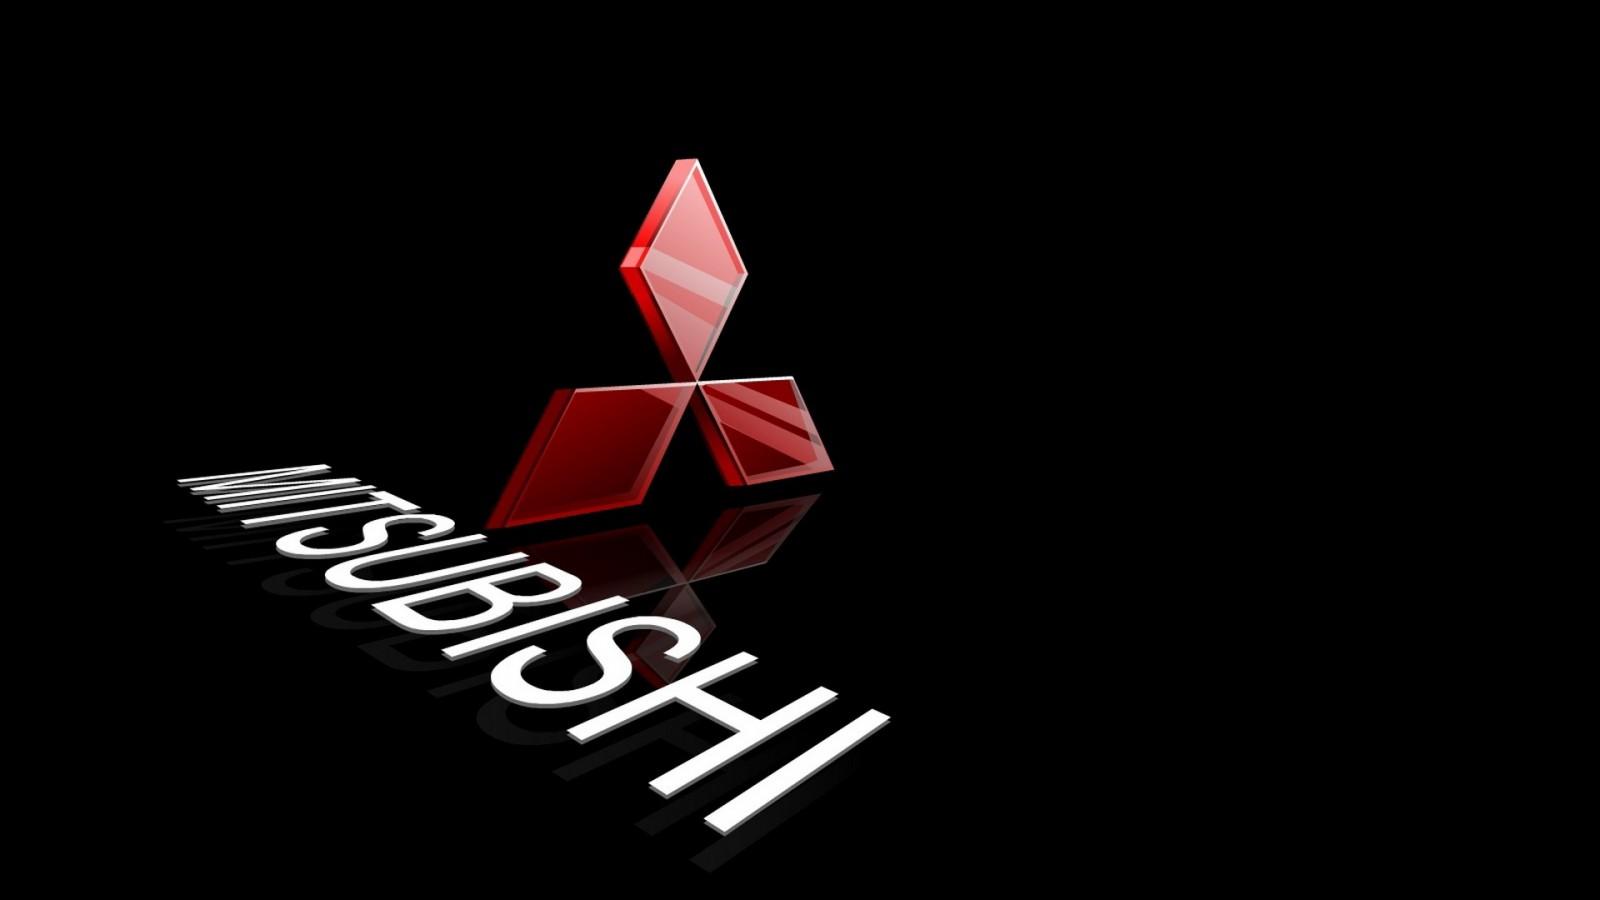 Download Mitsubishi Cars Logo HD Wallpapers   Fullsize Wallpaper 1600x900